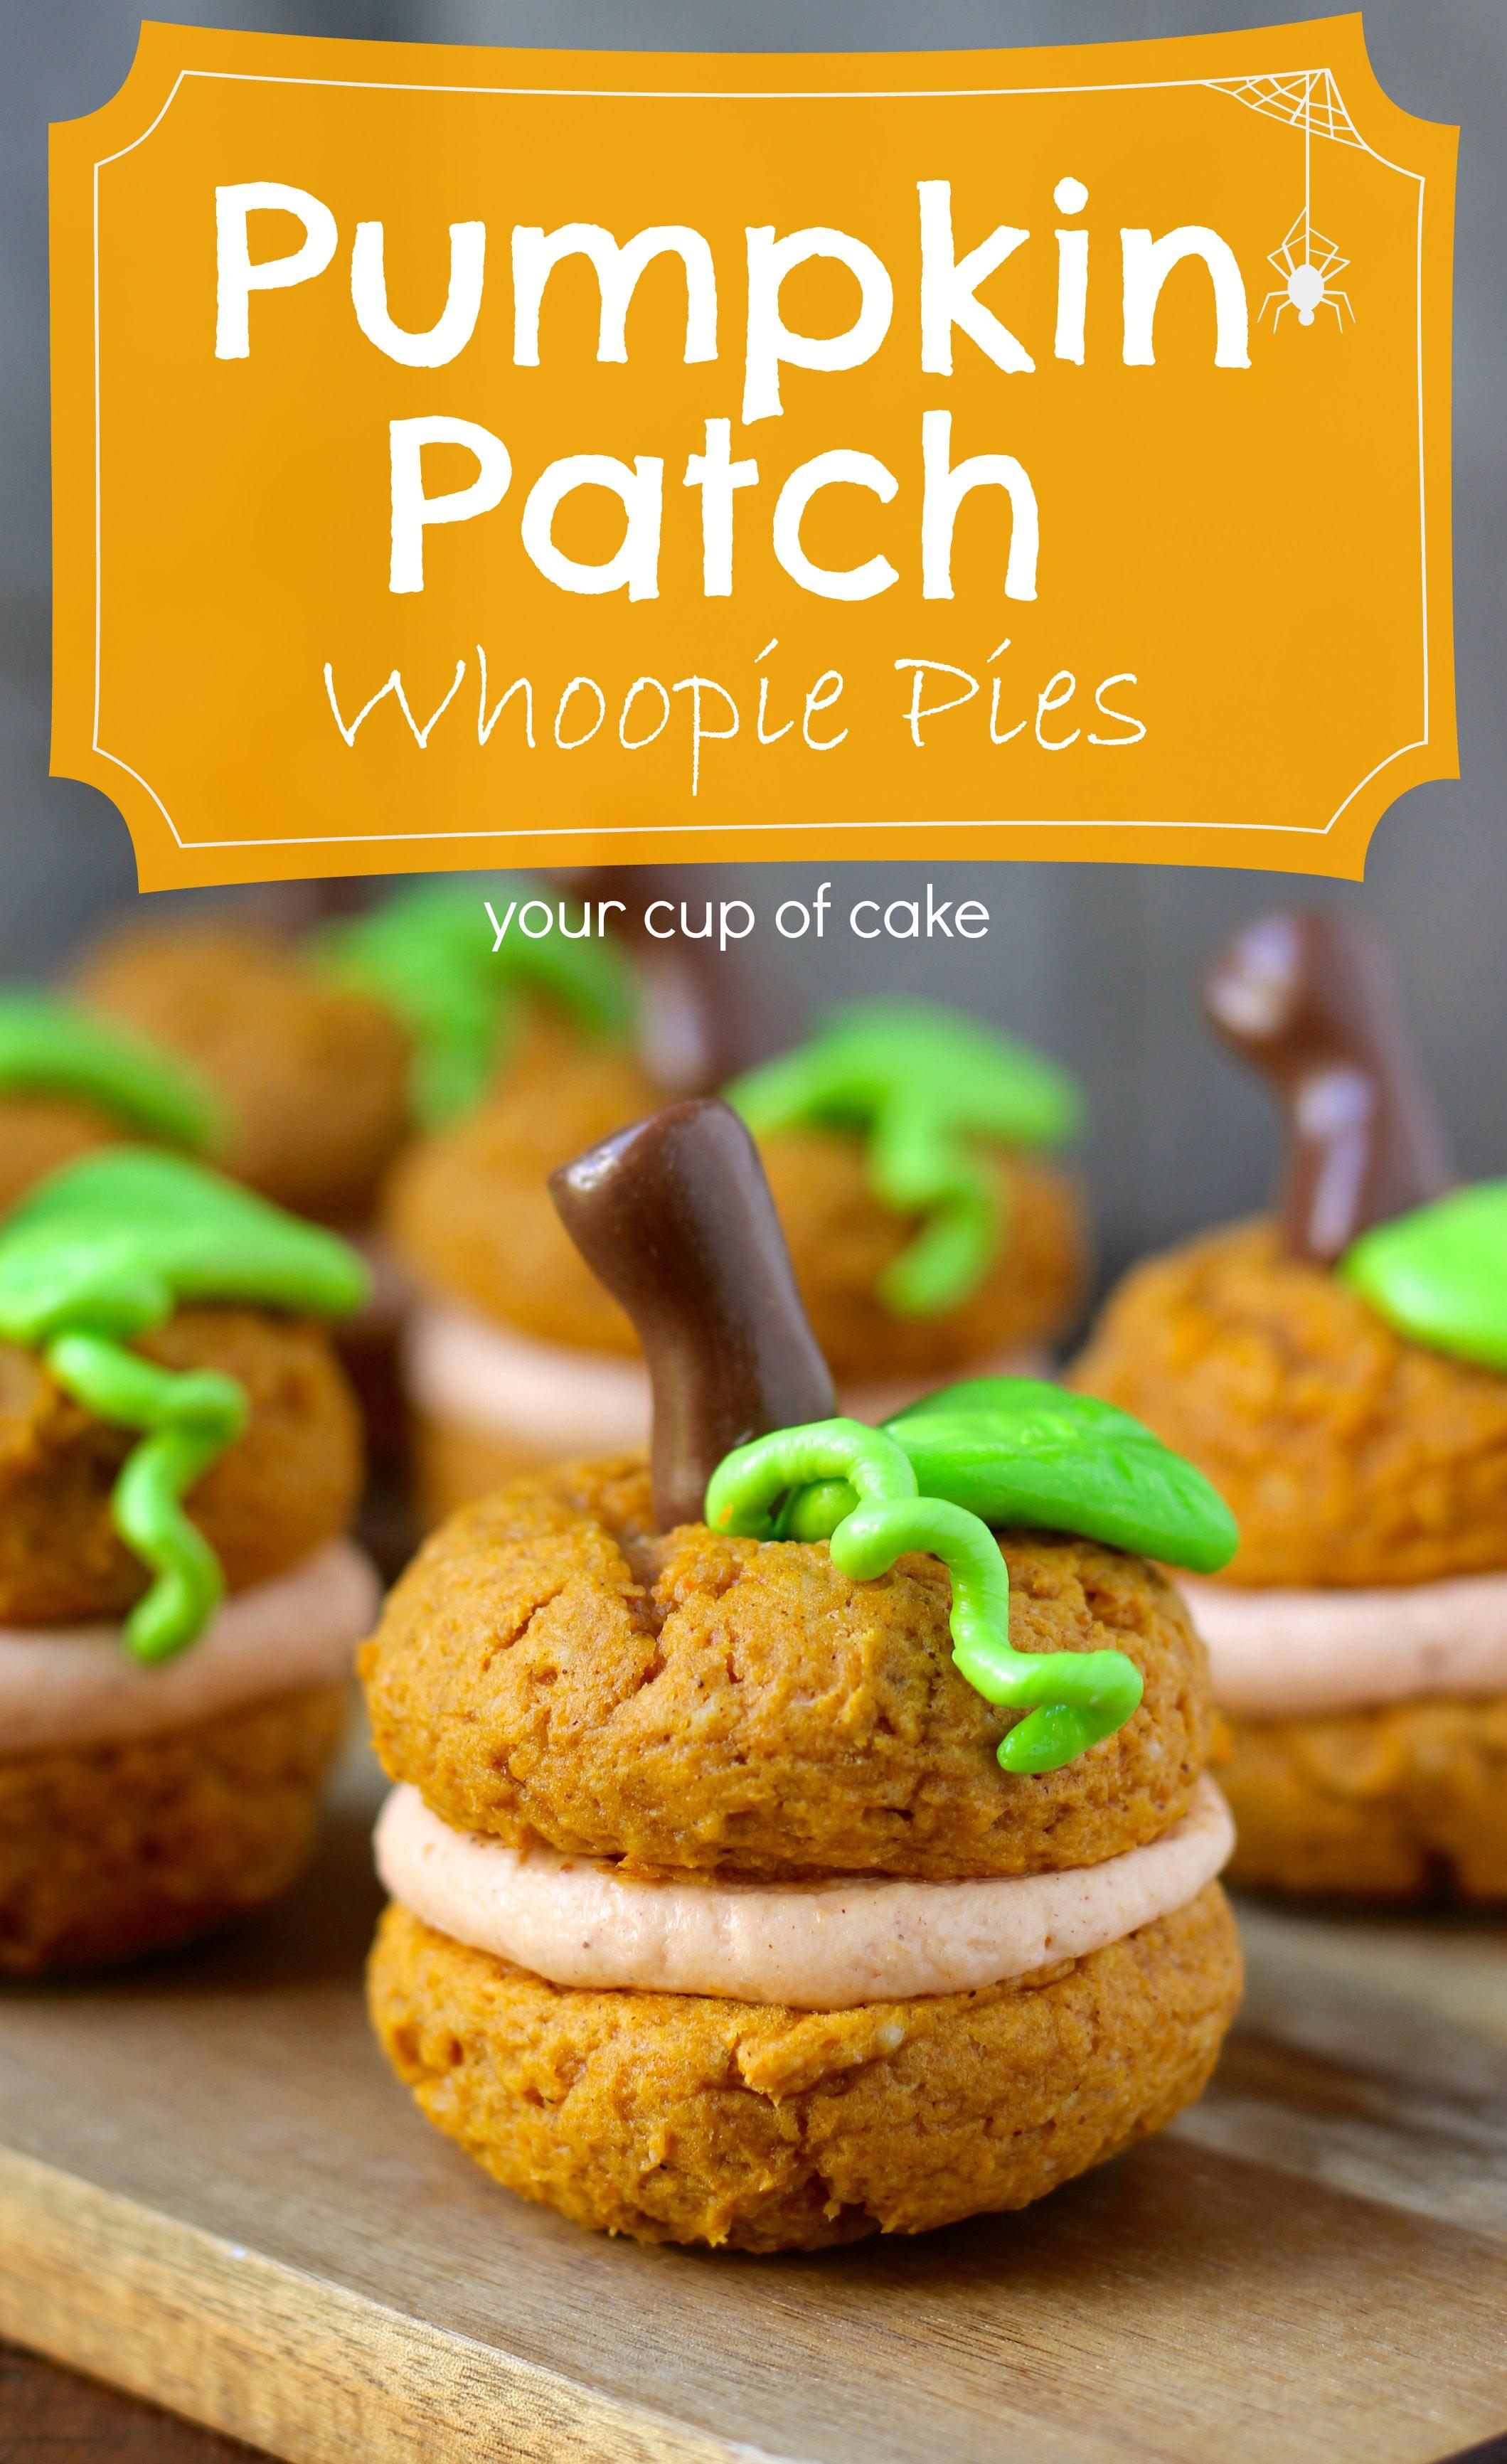 Pumpkin Patch Whoopie Pies